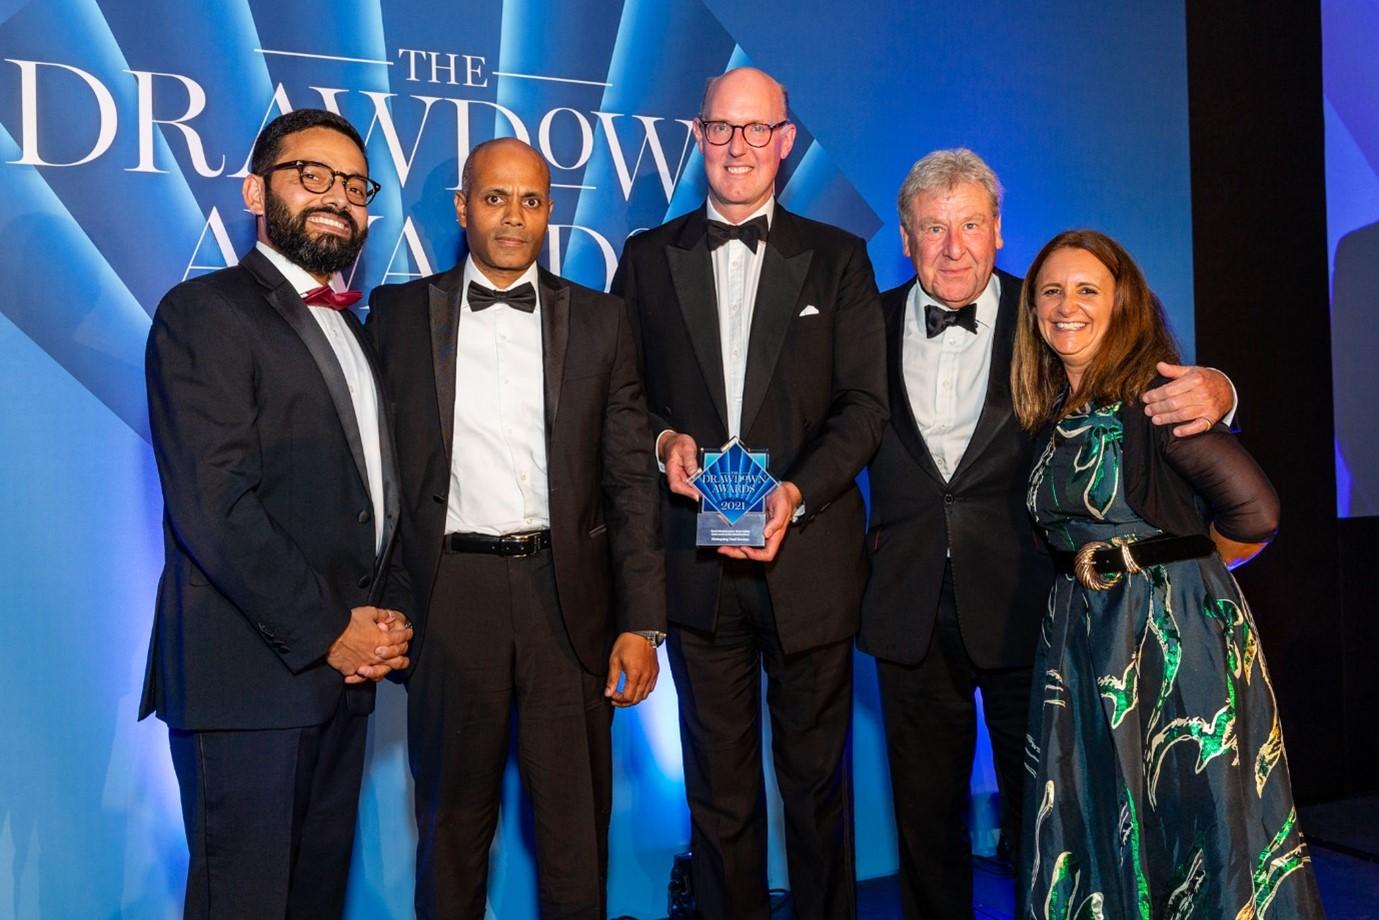 Drawdown Awars Winner 2021 mainspring Fund Services